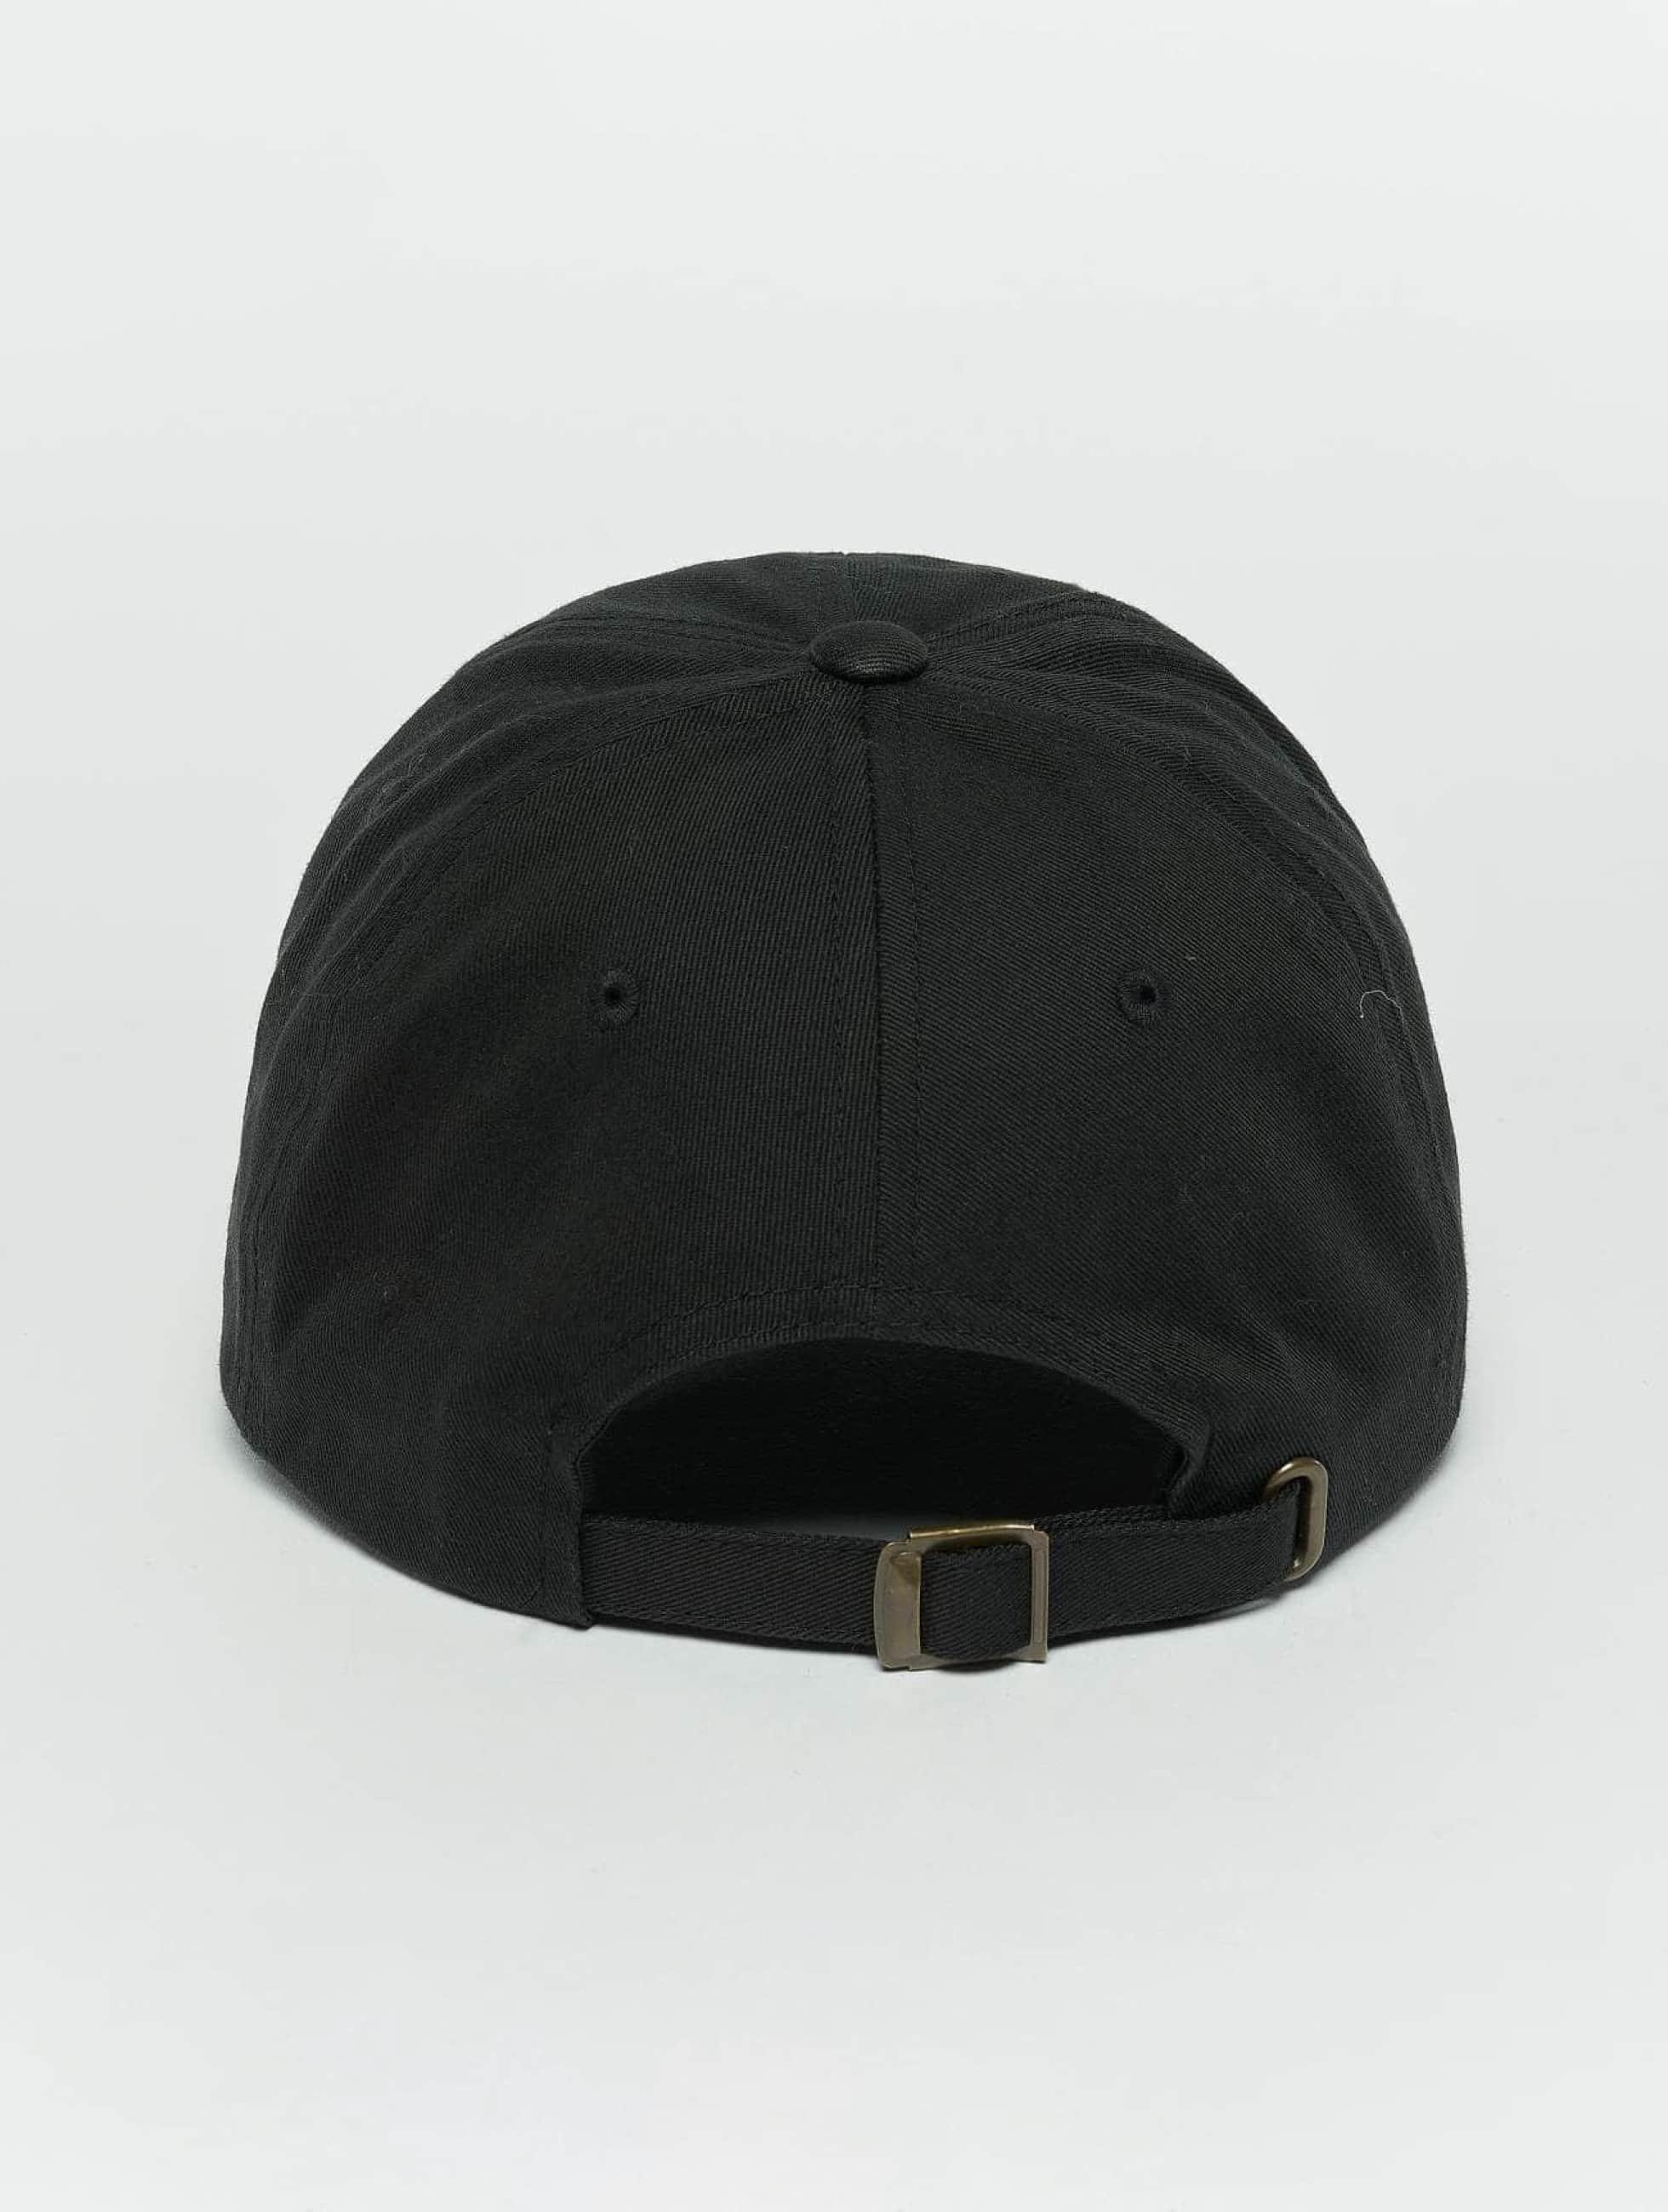 TurnUP Кепка с застёжкой Smever черный